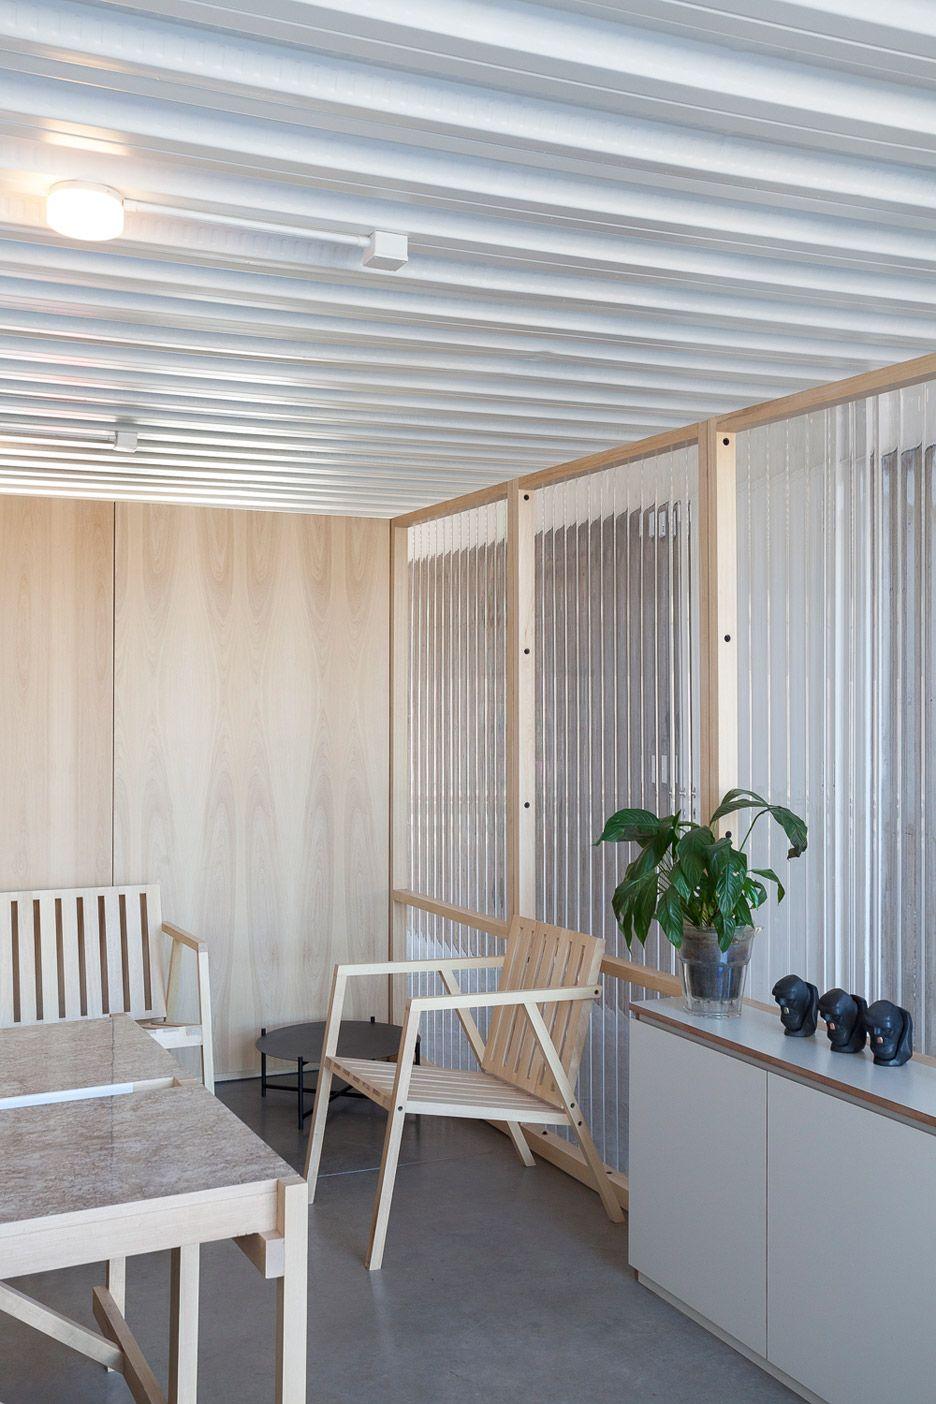 Argentinian Studio It Met Used Corrugated Plastic And